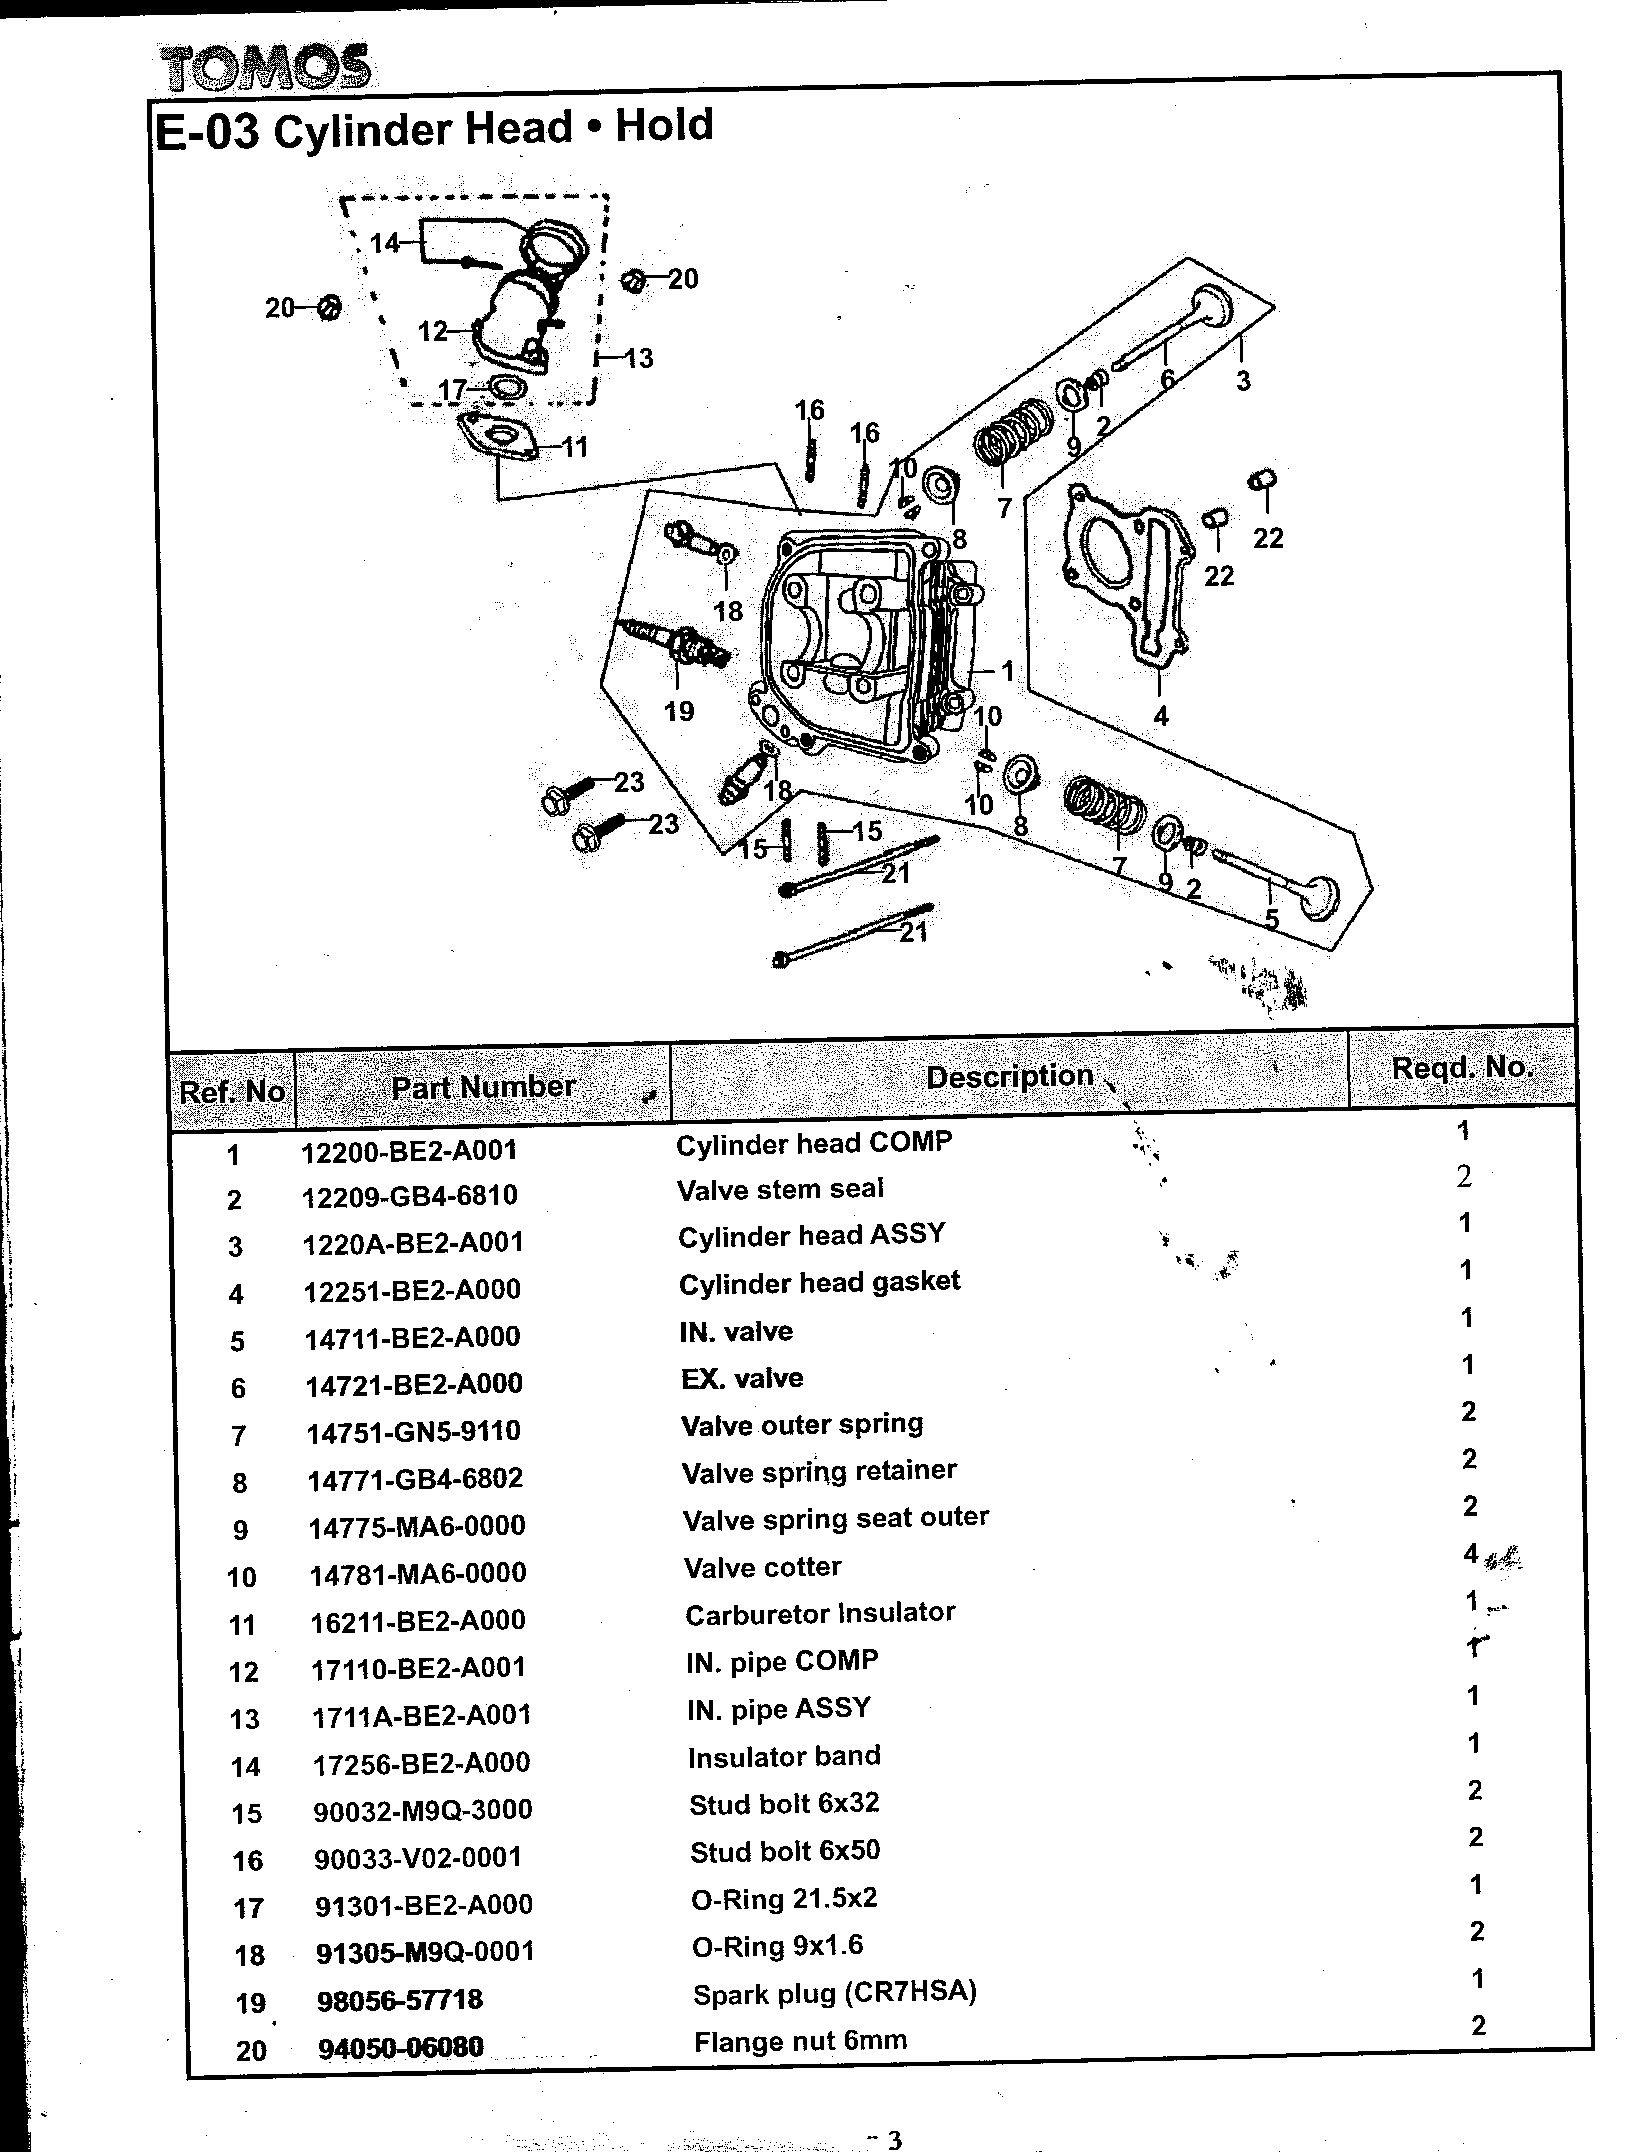 Tomos Nitro 50 Wiring Diagram 2000 Dodge Grand Caravan Wiring Diagram Tomberlins Tukune Jeanjaures37 Fr